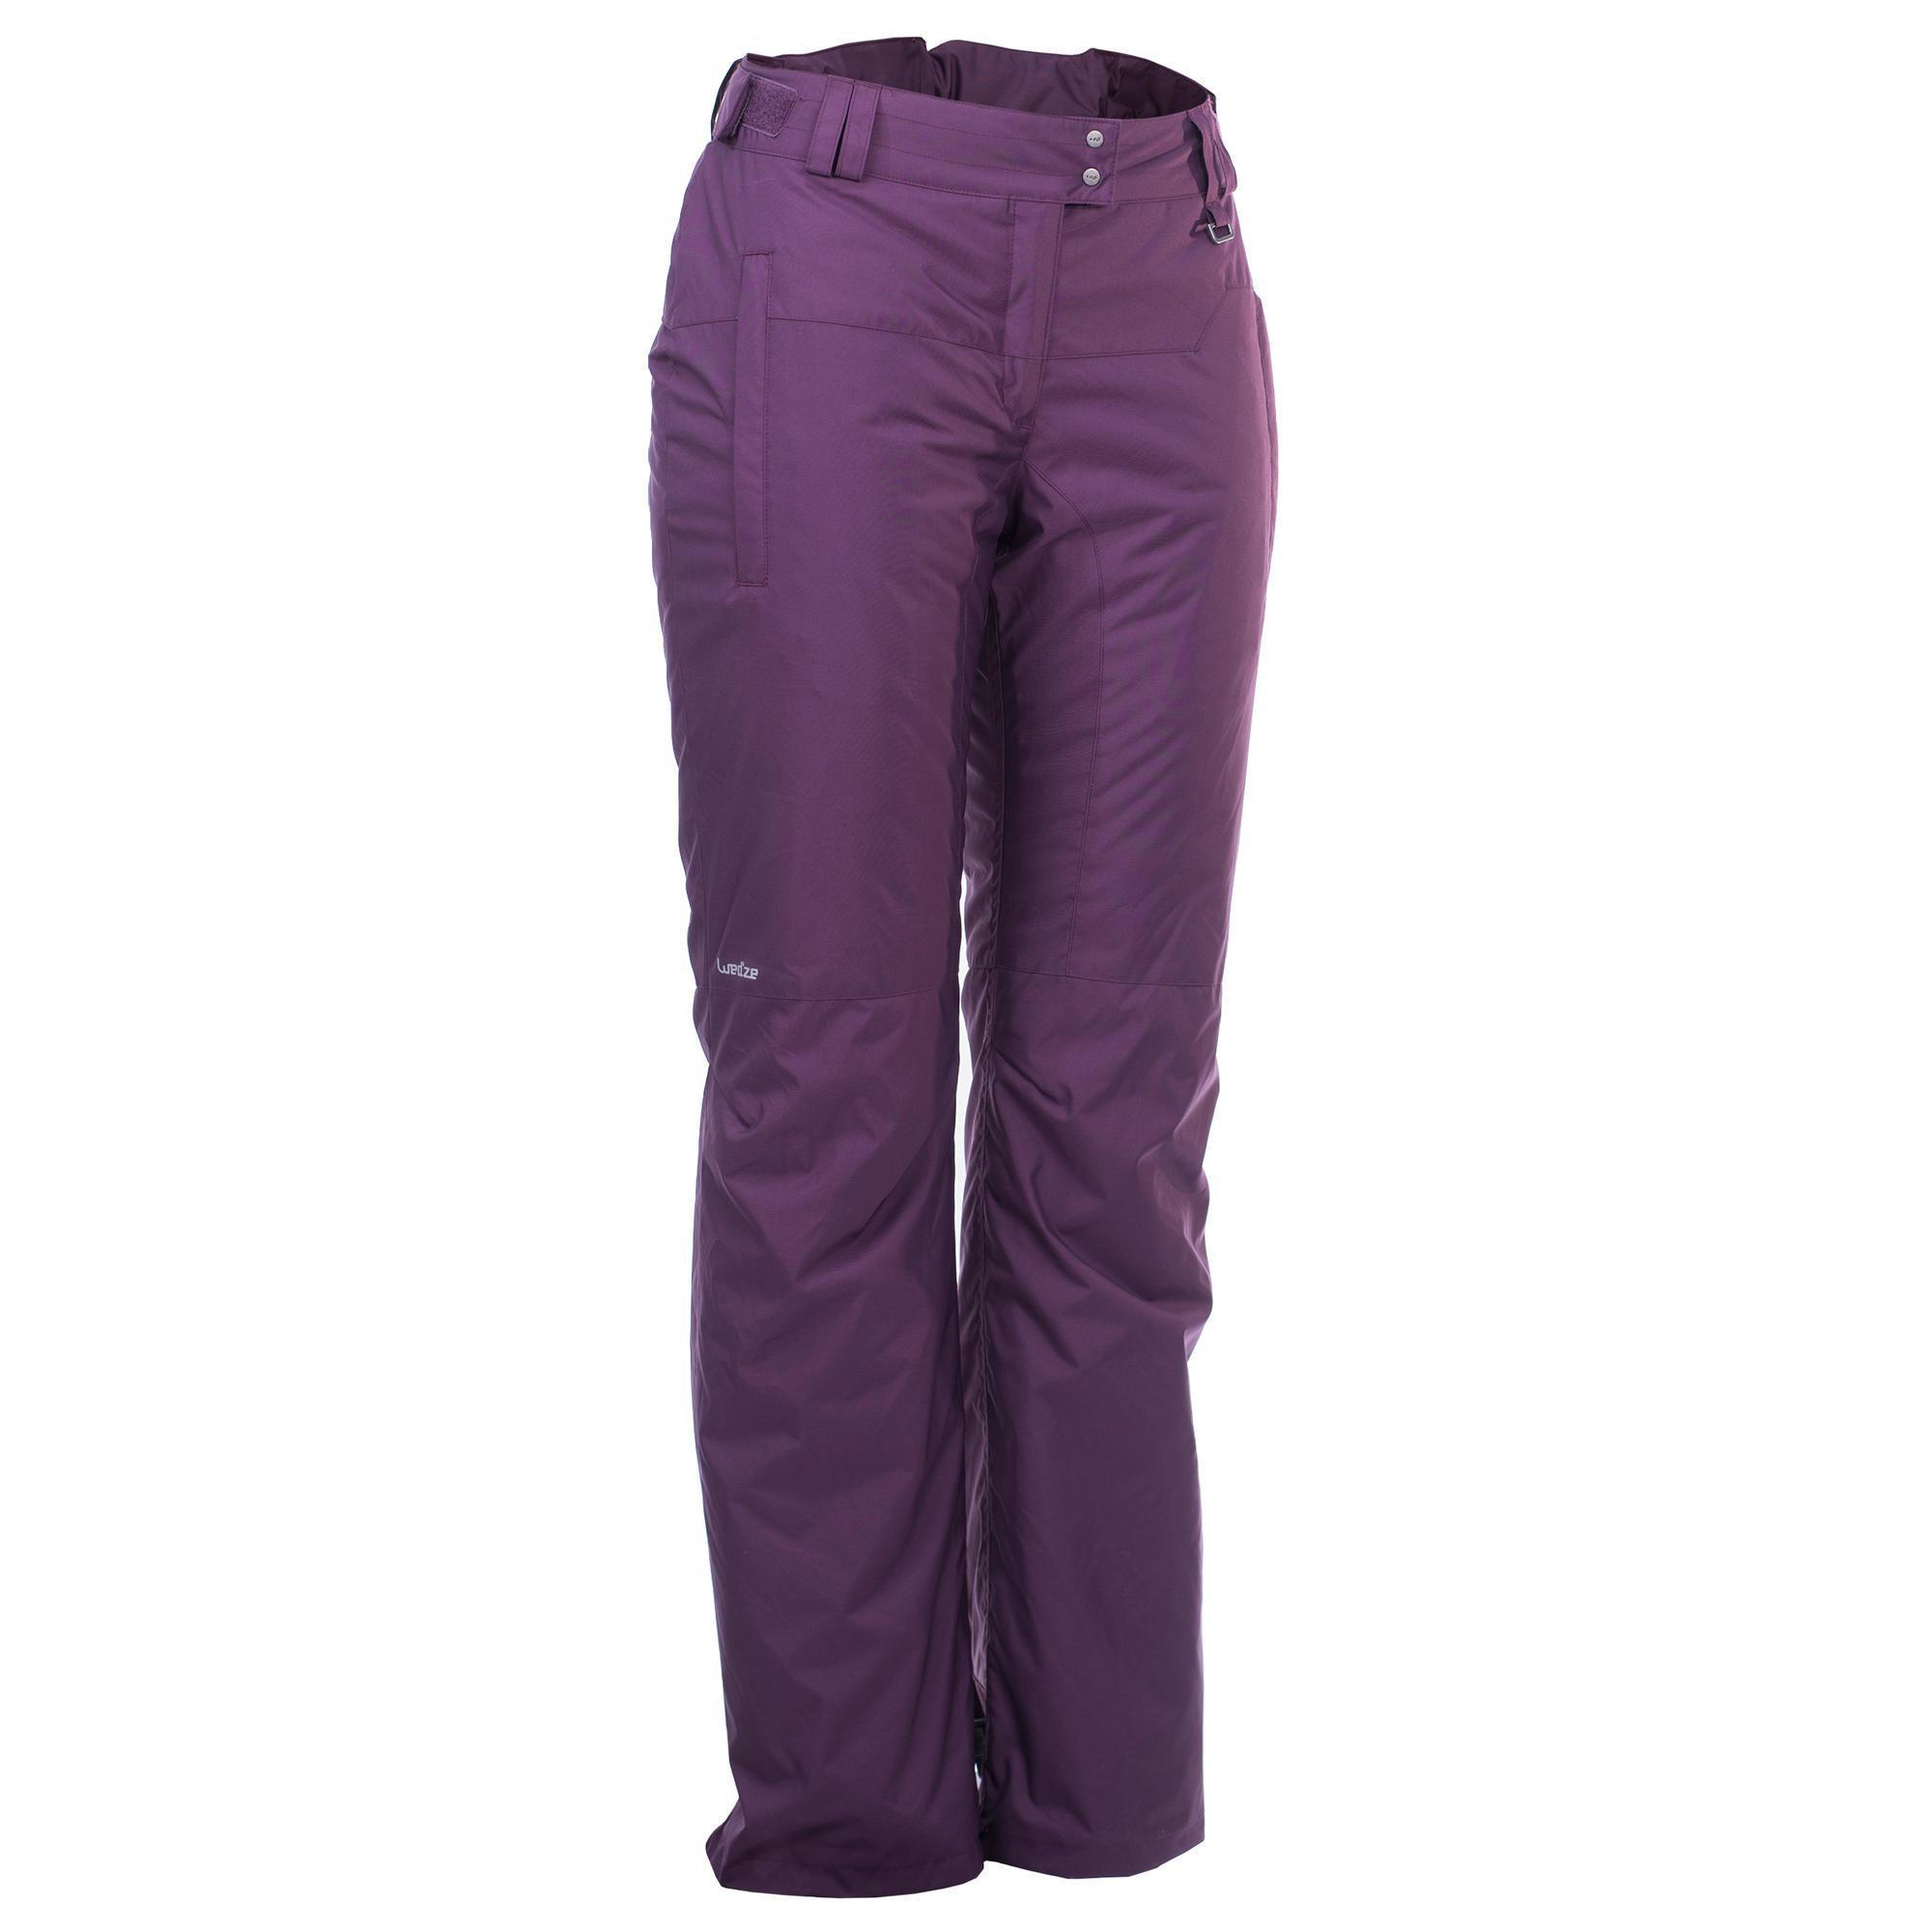 Damen Snowboardhose SNB PA 100 Damen violett | 03608449875356